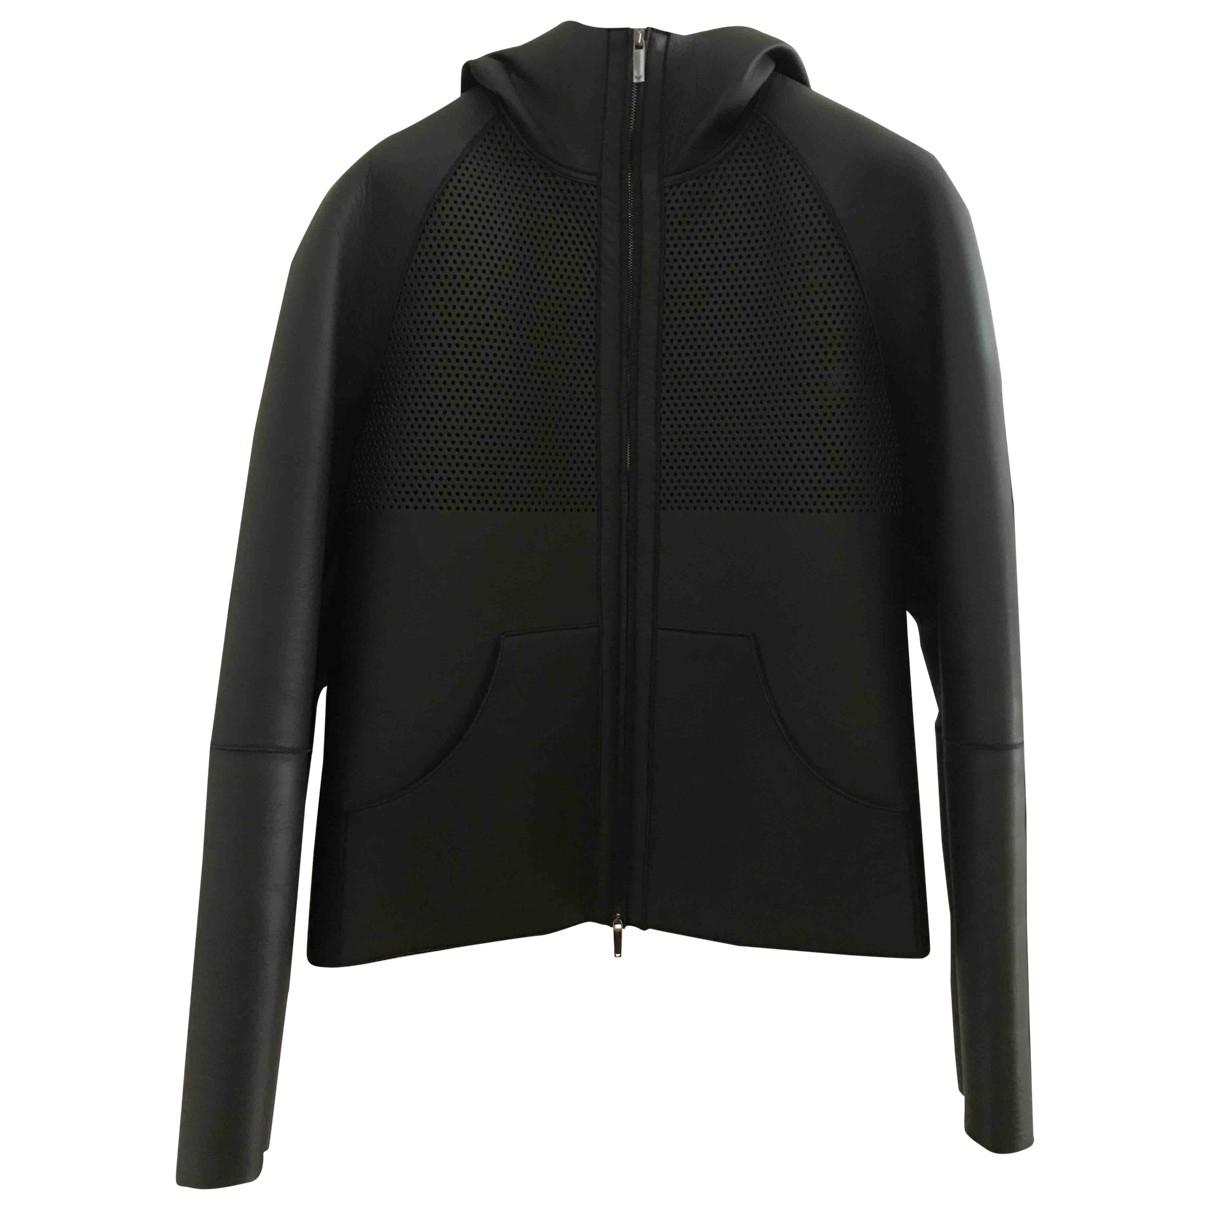 Emporio Armani \N Black Leather jacket  for Men 46 IT